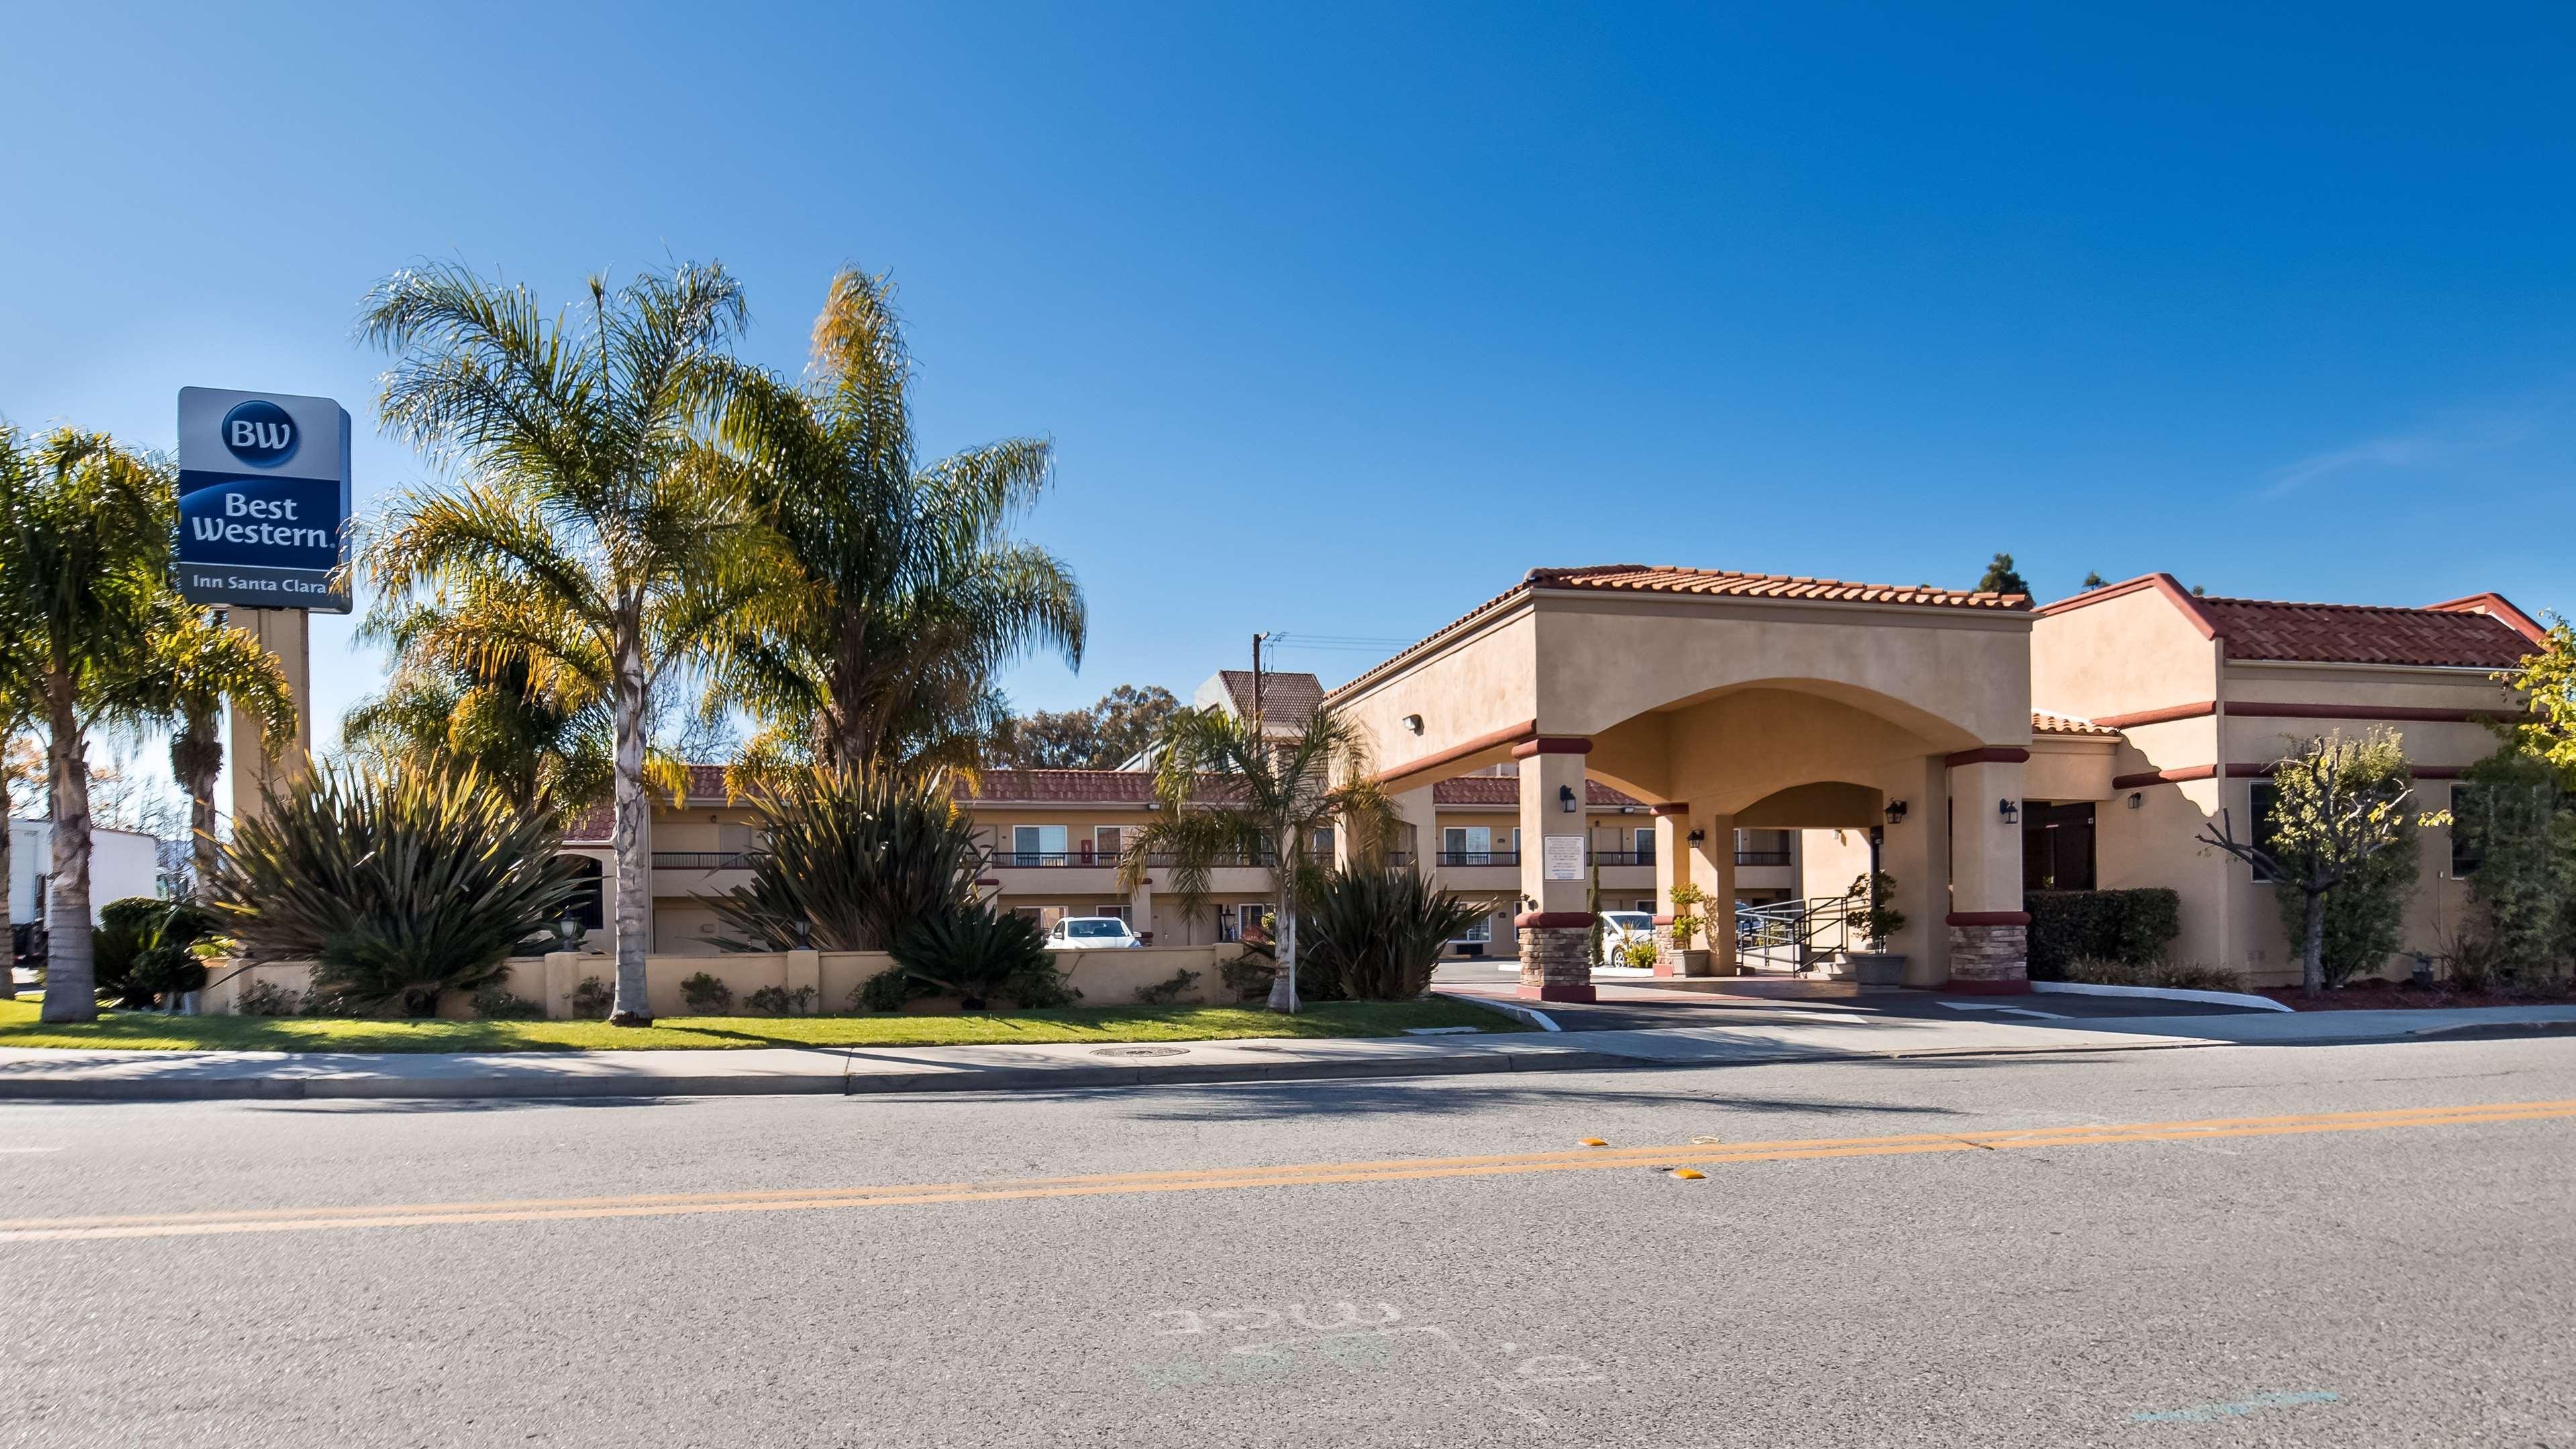 Best Western Inn Santa Clara image 1